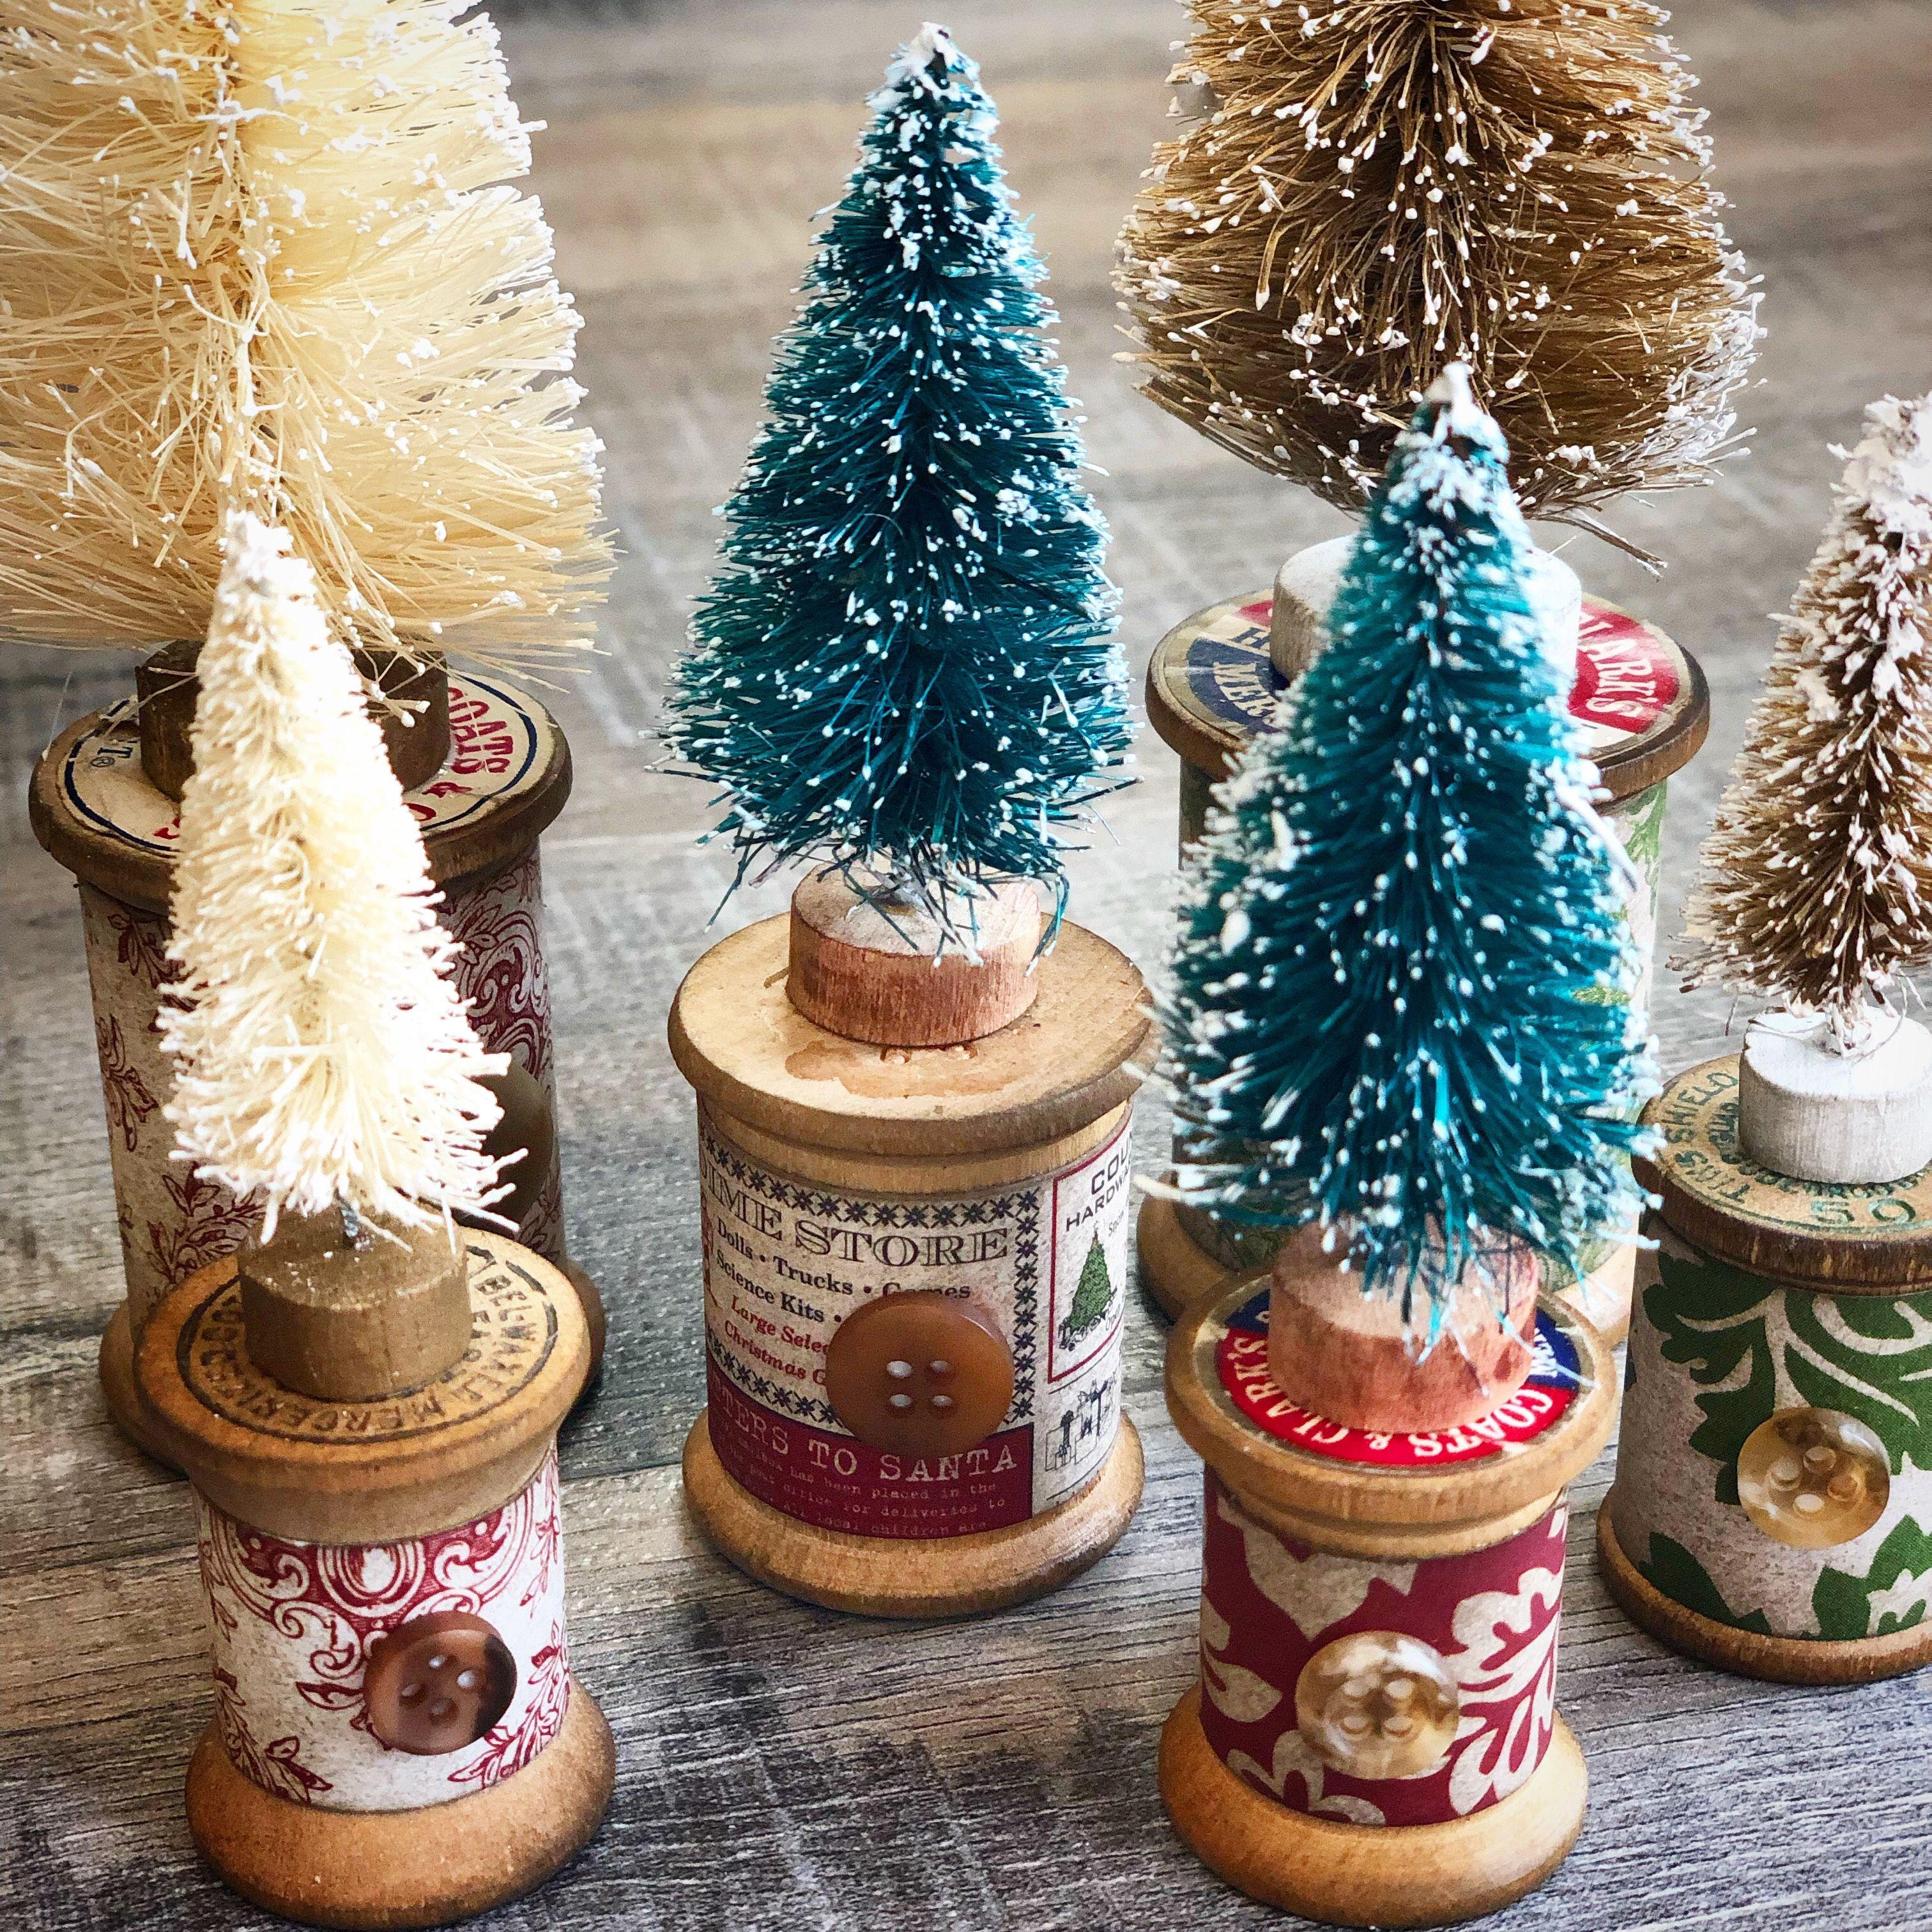 Tiny Bottle Brush Christmas Trees On Vintage Wood Spools Vintage Christmas Crafts Bottle Brush Christmas Trees Diy Christmas Ornaments